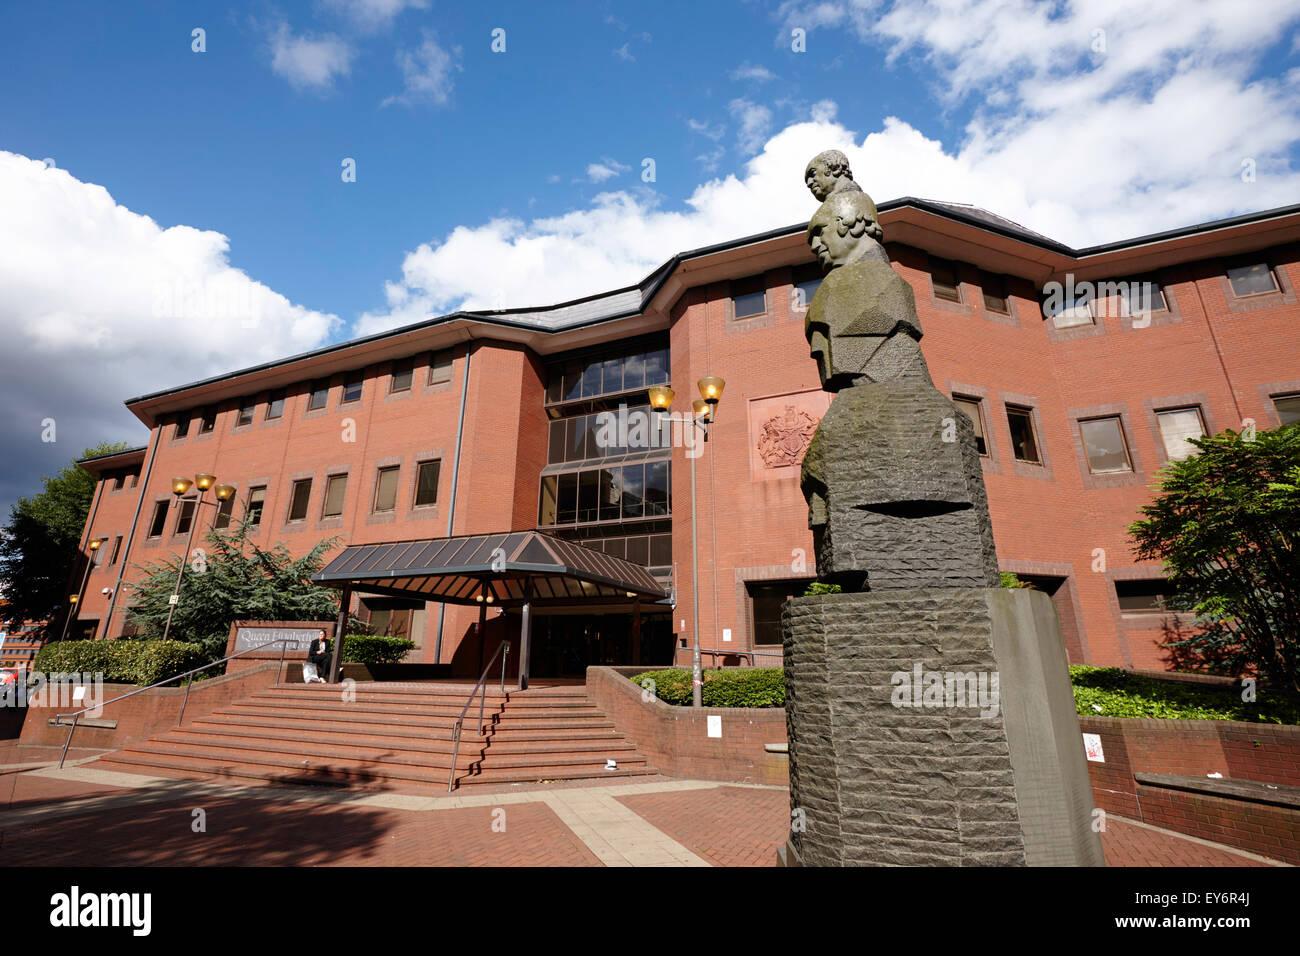 Queen Elizabeth 2 Law Courts Crown Court Birmingham Uk Stock Photo Alamy